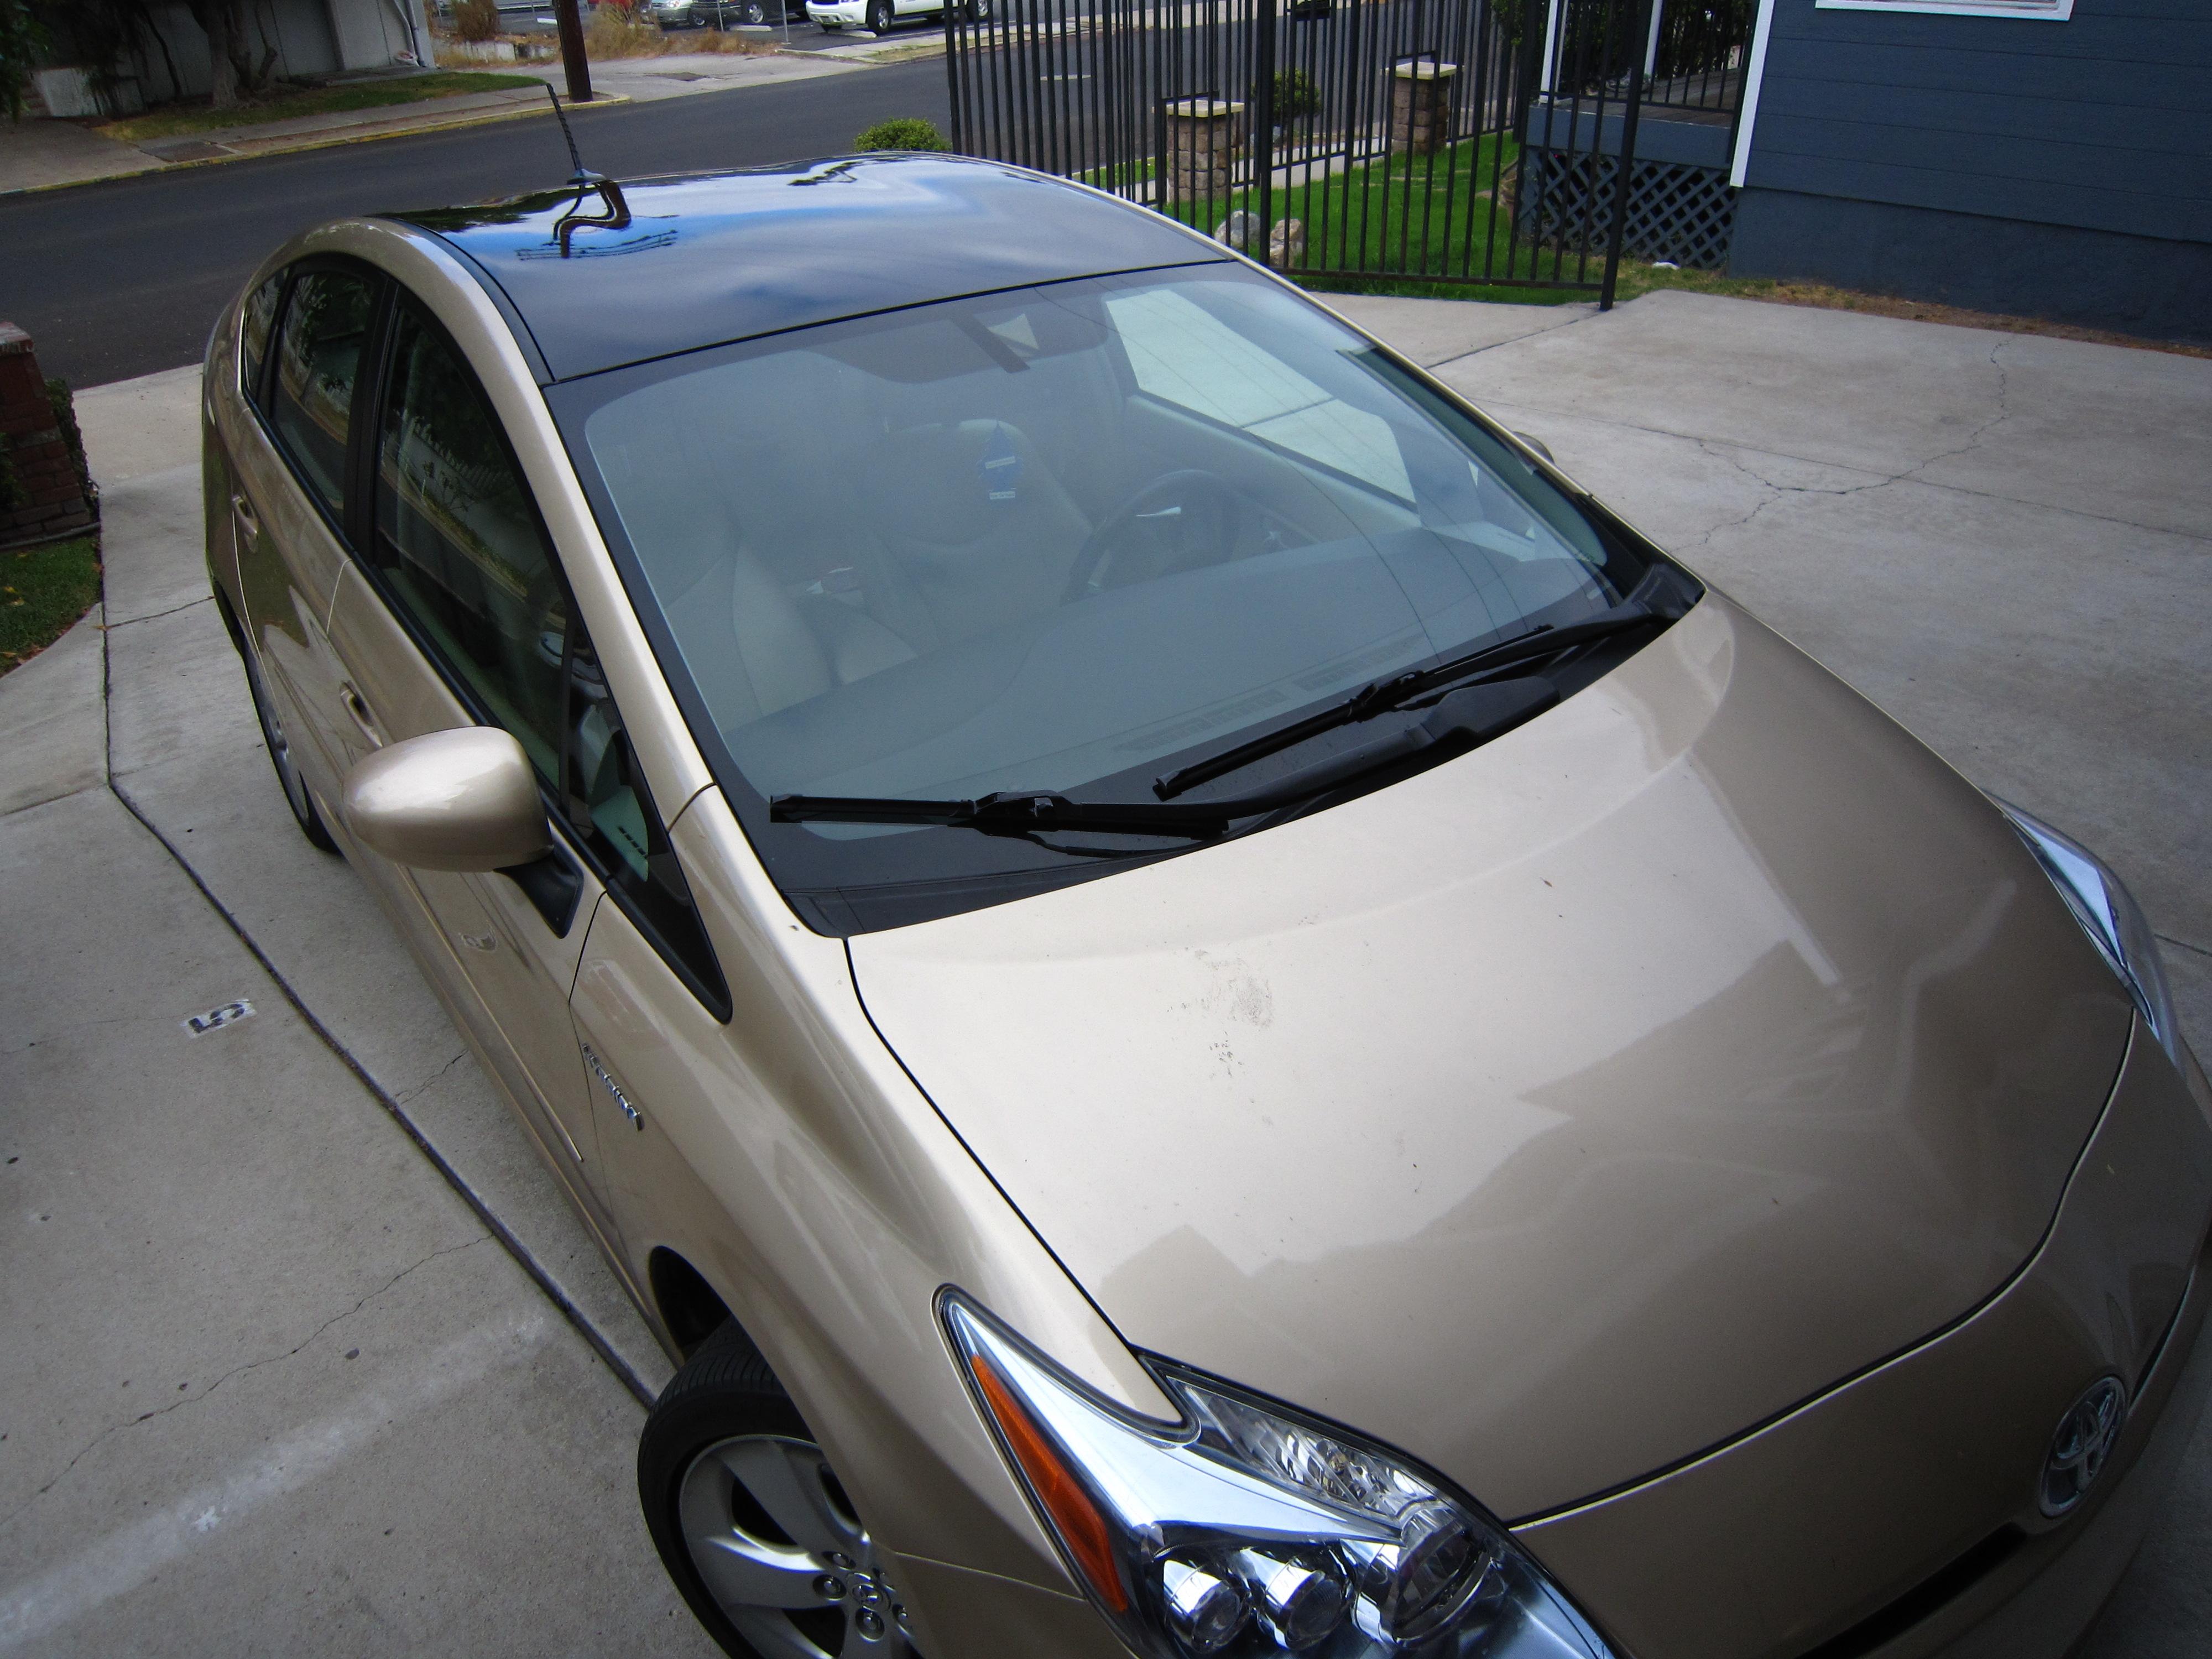 2010 prius custom black roof overlay diy priuschat rh priuschat com 2010 toyota prius solar roof package 2014 Toyota Prius Solar Roof Package